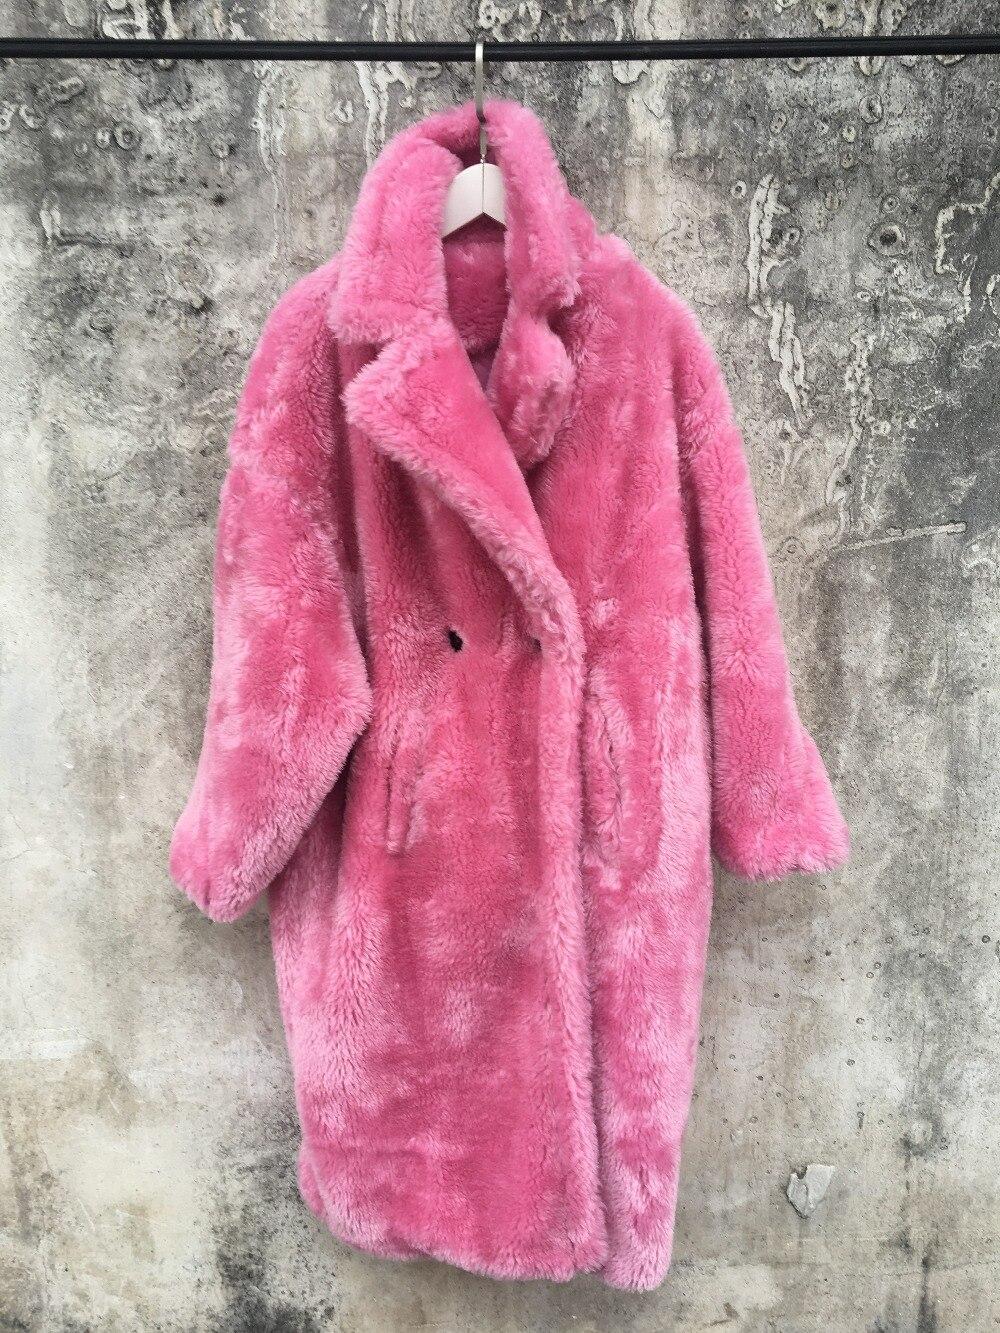 9d024d6a17bc 2018 New female long coat teddy coat faux fur coat leopard print womens  plus size fashions pink fur coat 399.8 ₪